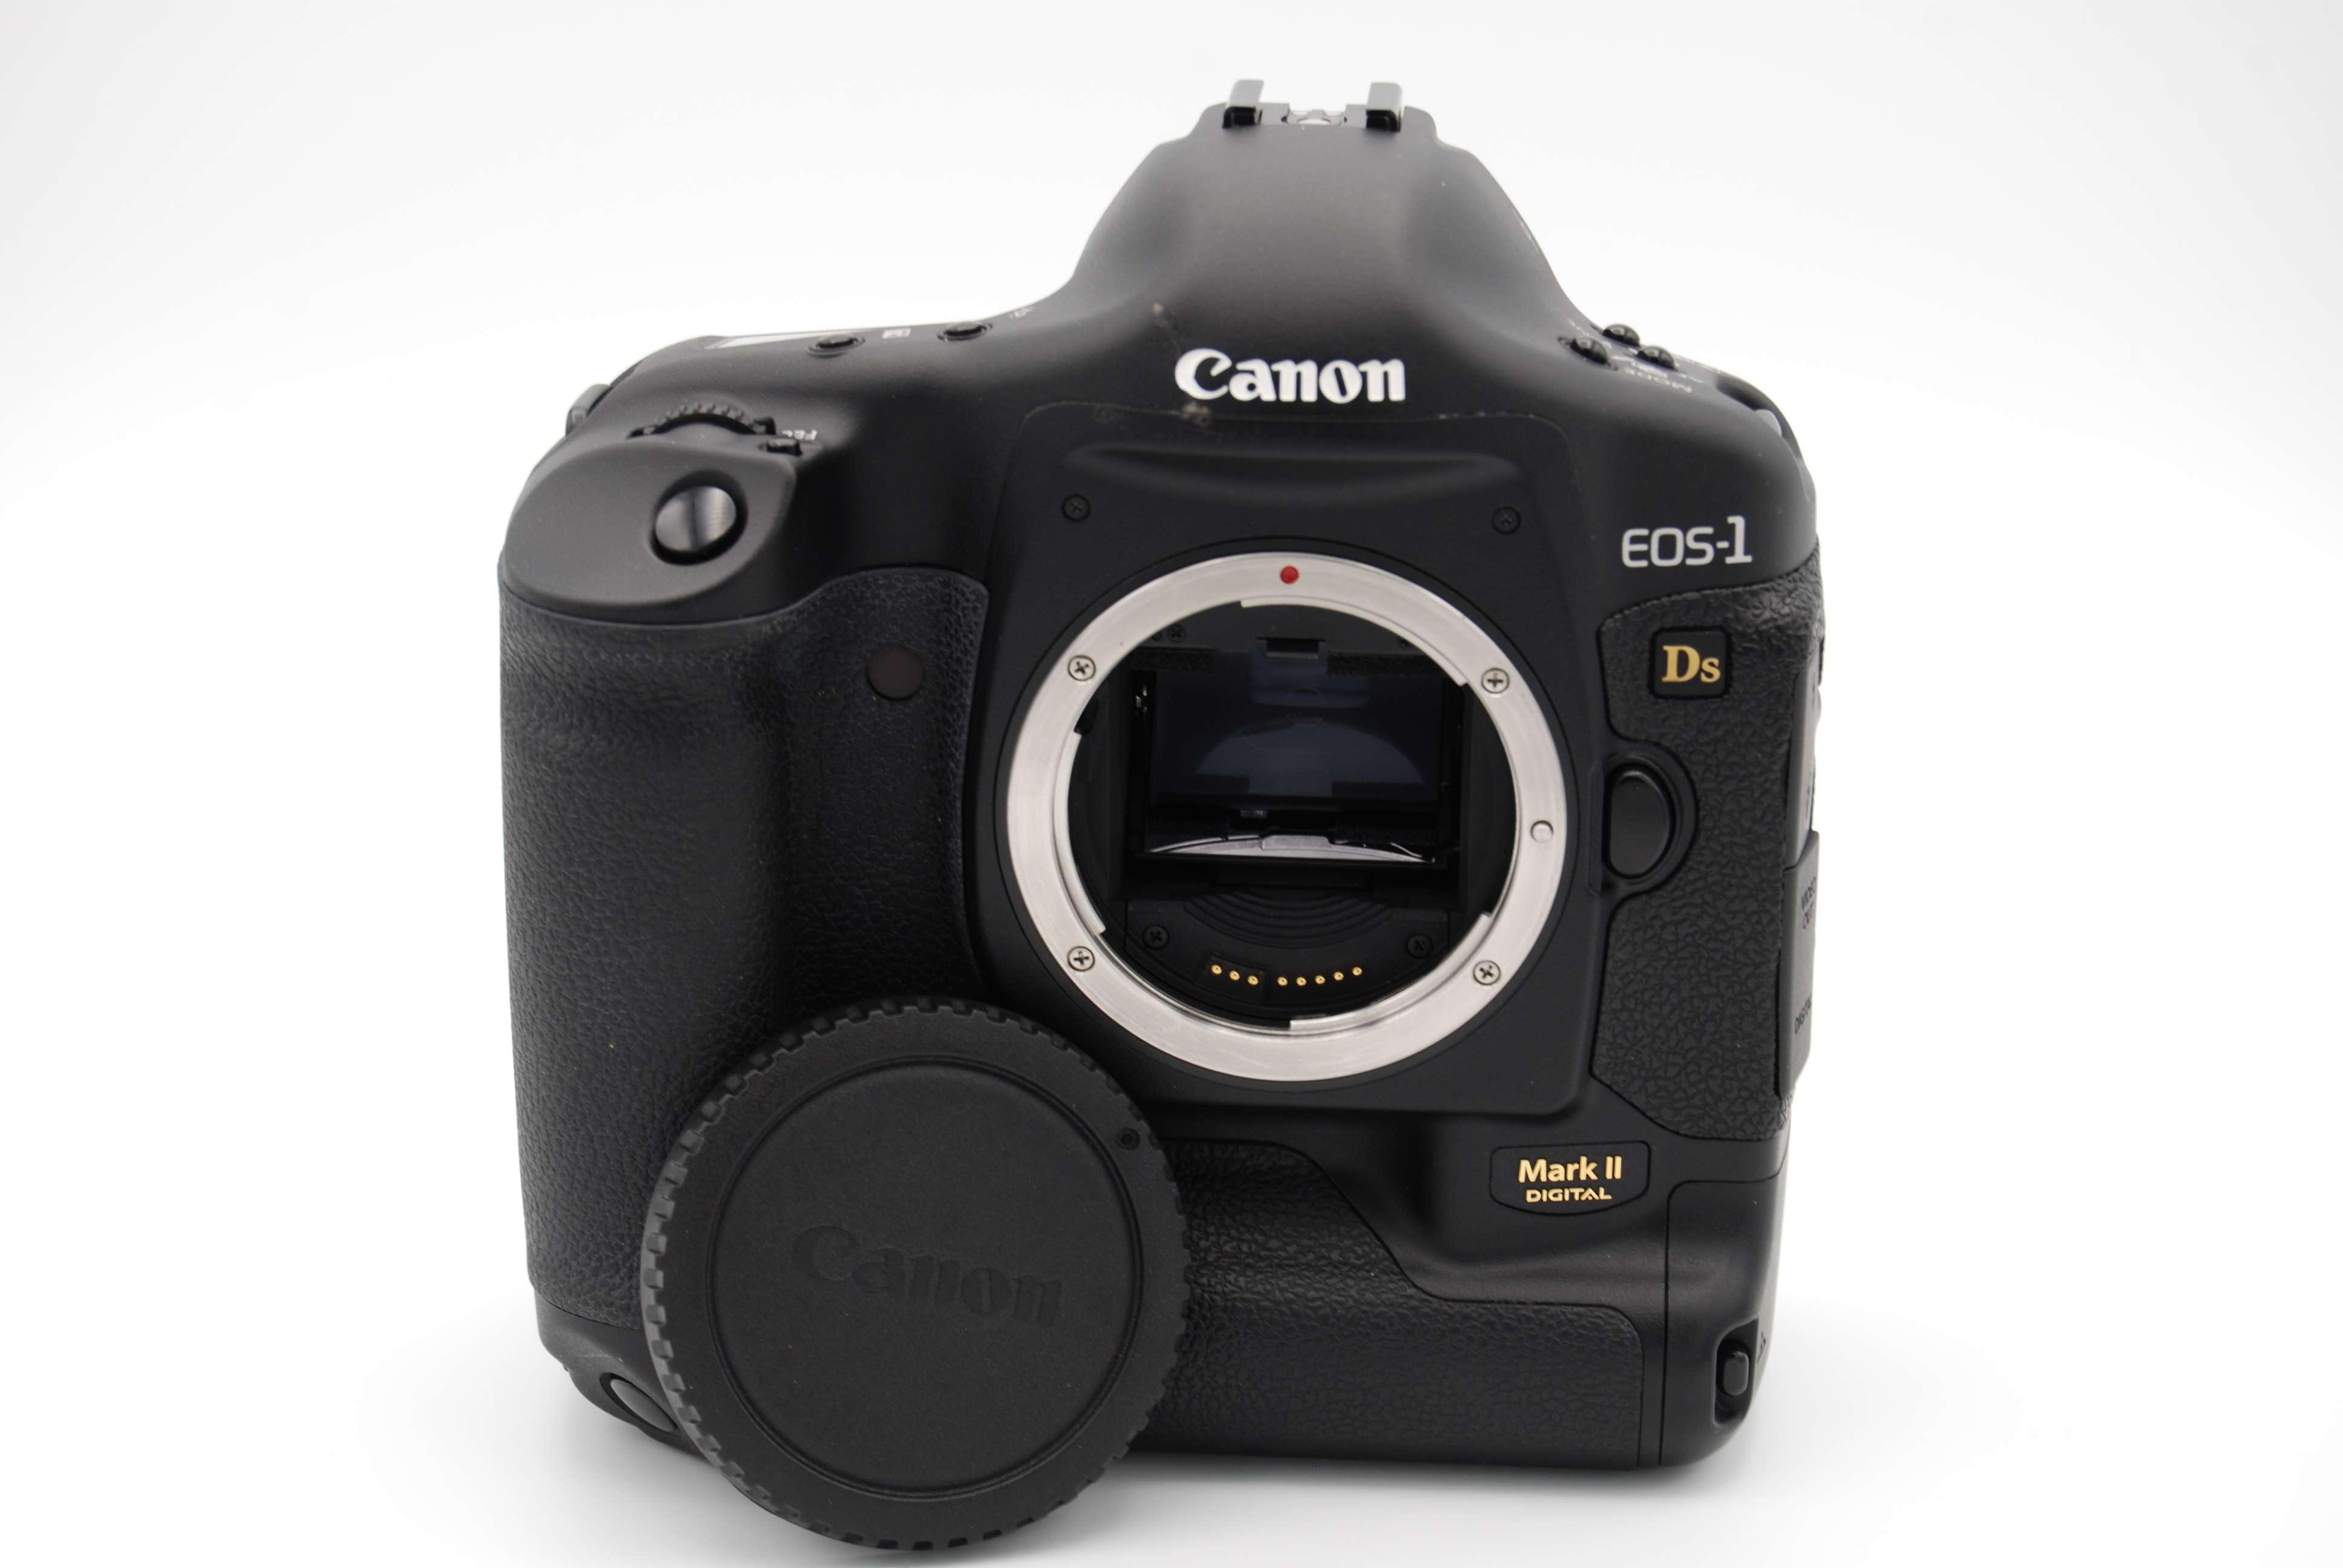 canon eos 1ds mark ii 16 7 mp 2 screen digital slr camera body rh ebay com